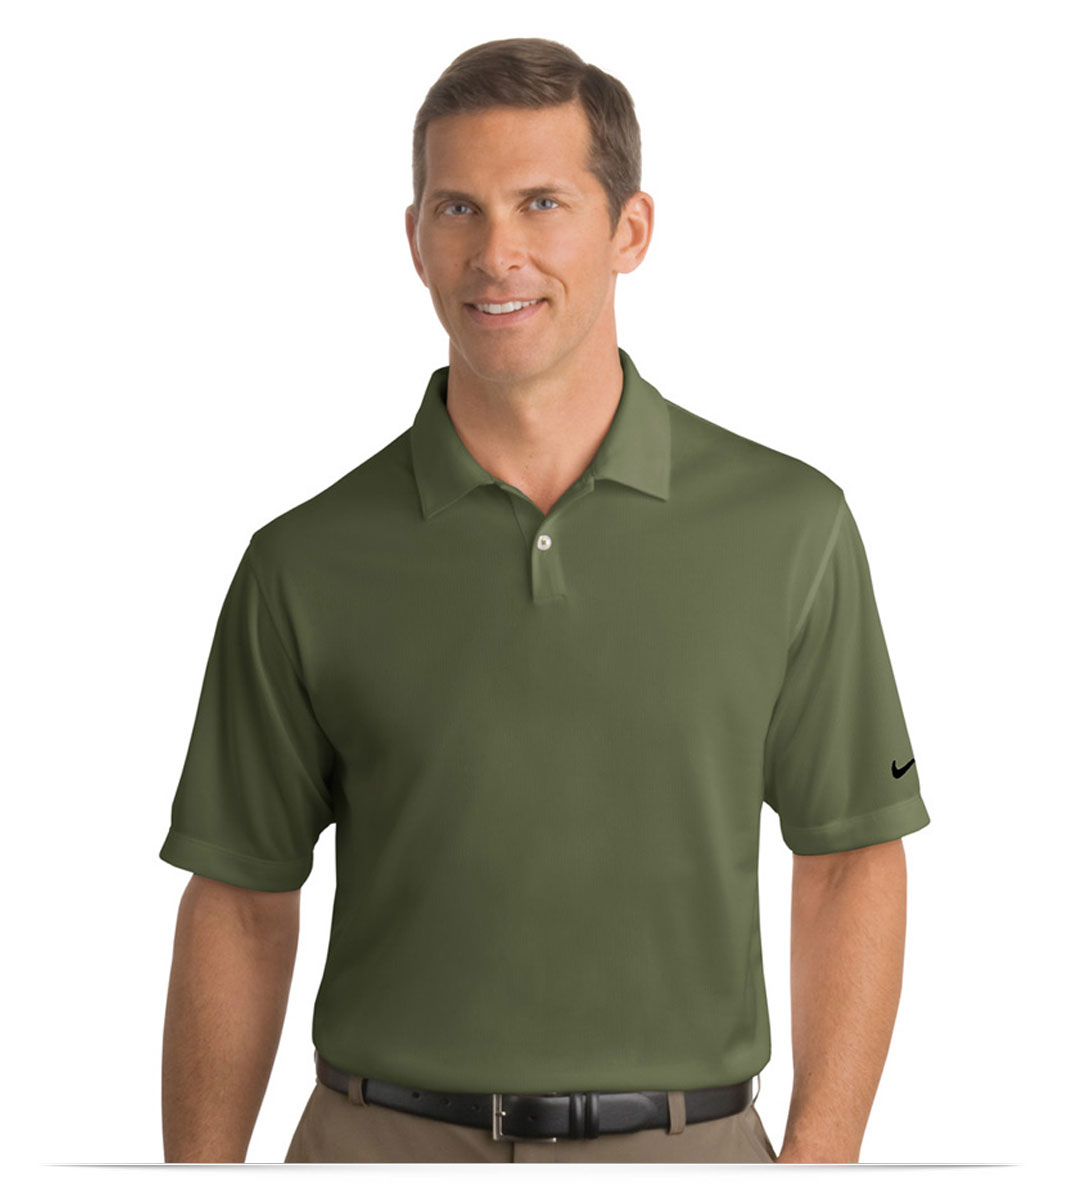 Design embroidered custom nike golf shirt online at for Embroidered nike golf shirts